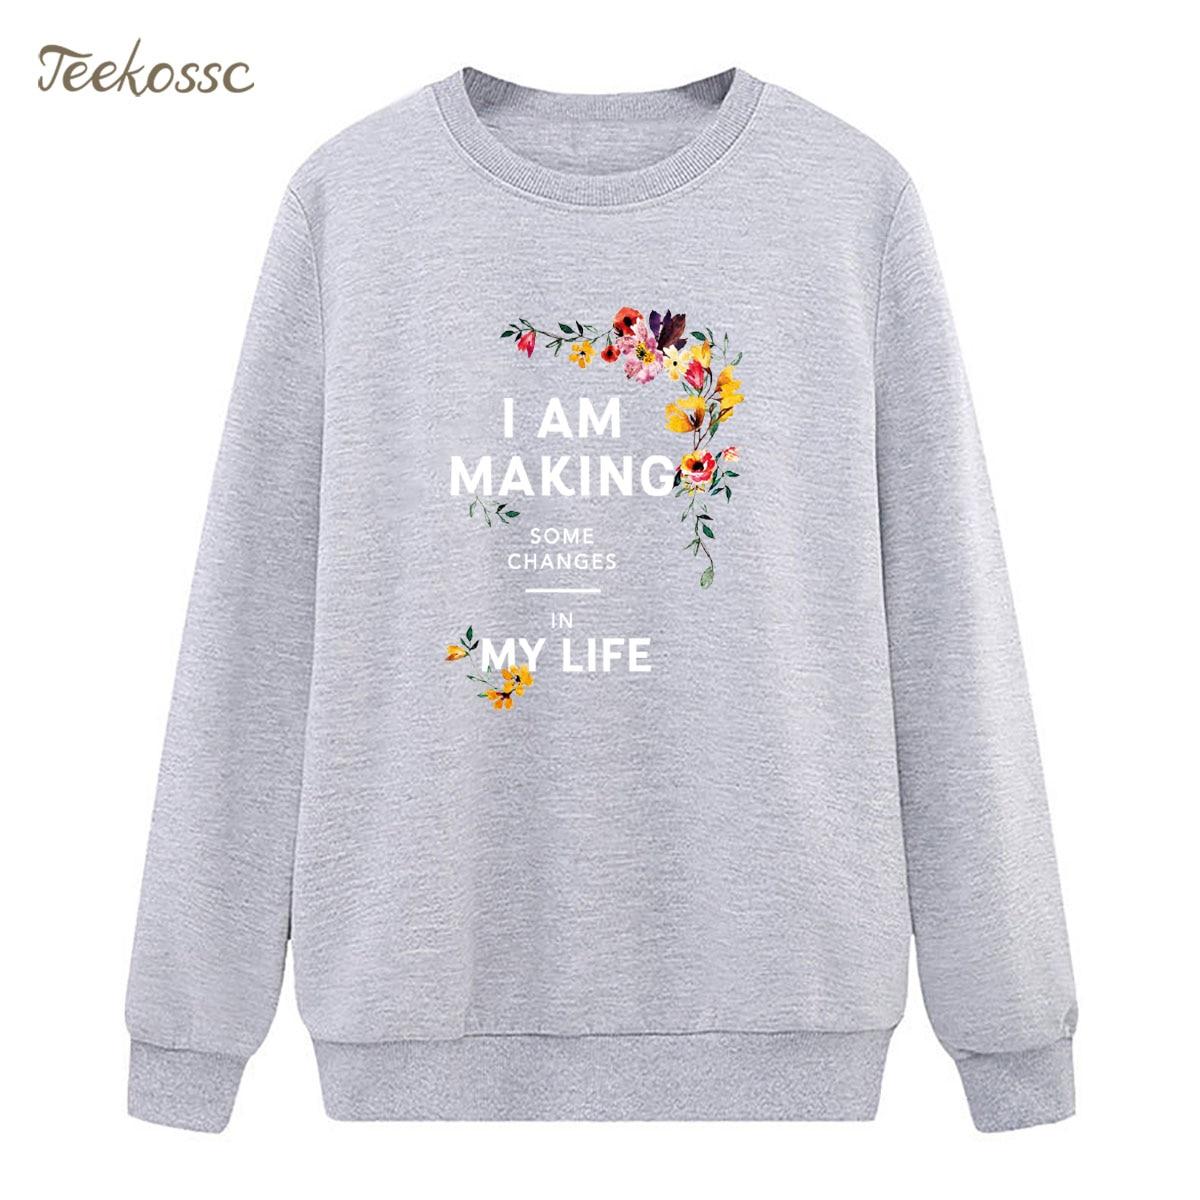 I am making some changes in my life Sweatshirt Flower Print Hoodie 2018 Winter Autumn Women Lady Pullover Fleece Warm Streetwear